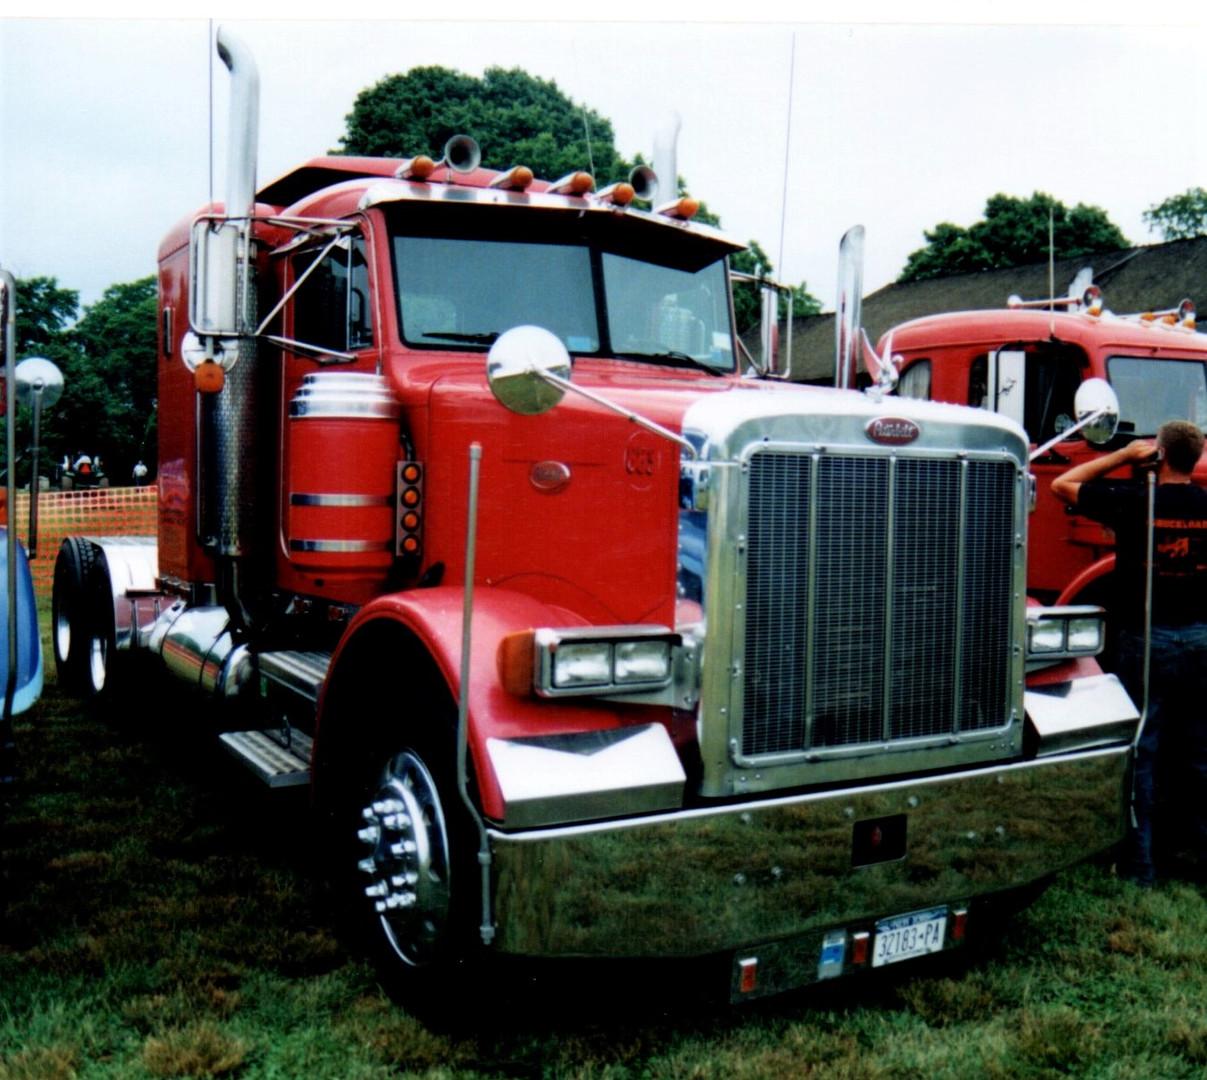 1988 Peterbilt 378 tractor - Jonathan Erb